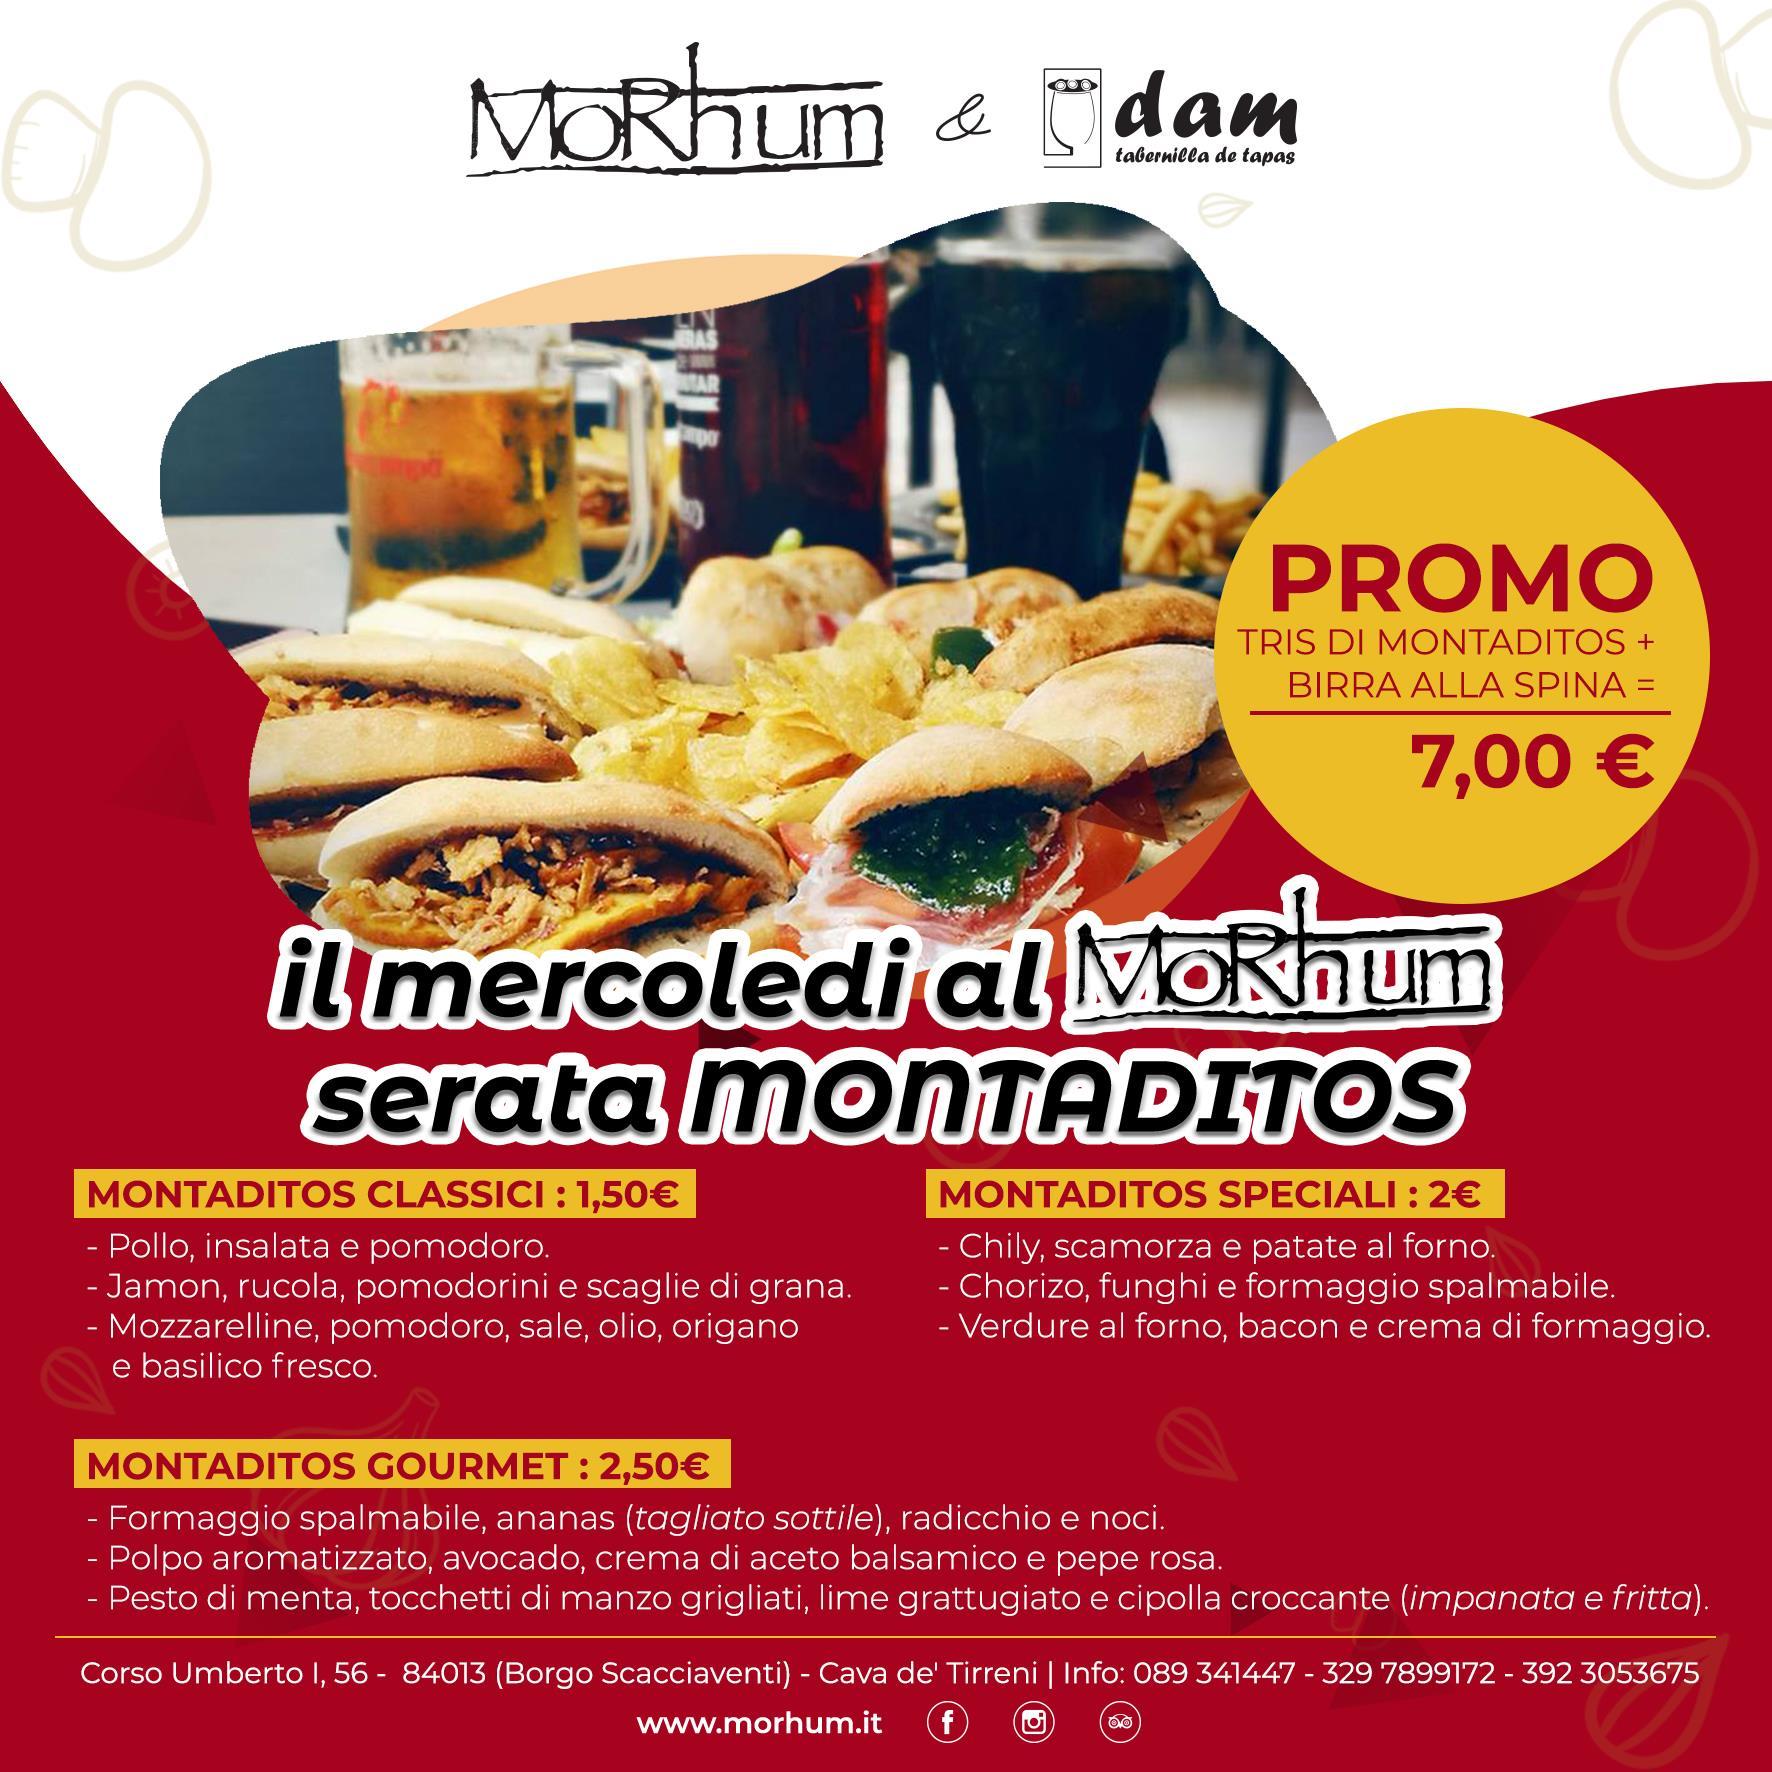 Morhum e DAM – Il mercoledì promo Montaditos